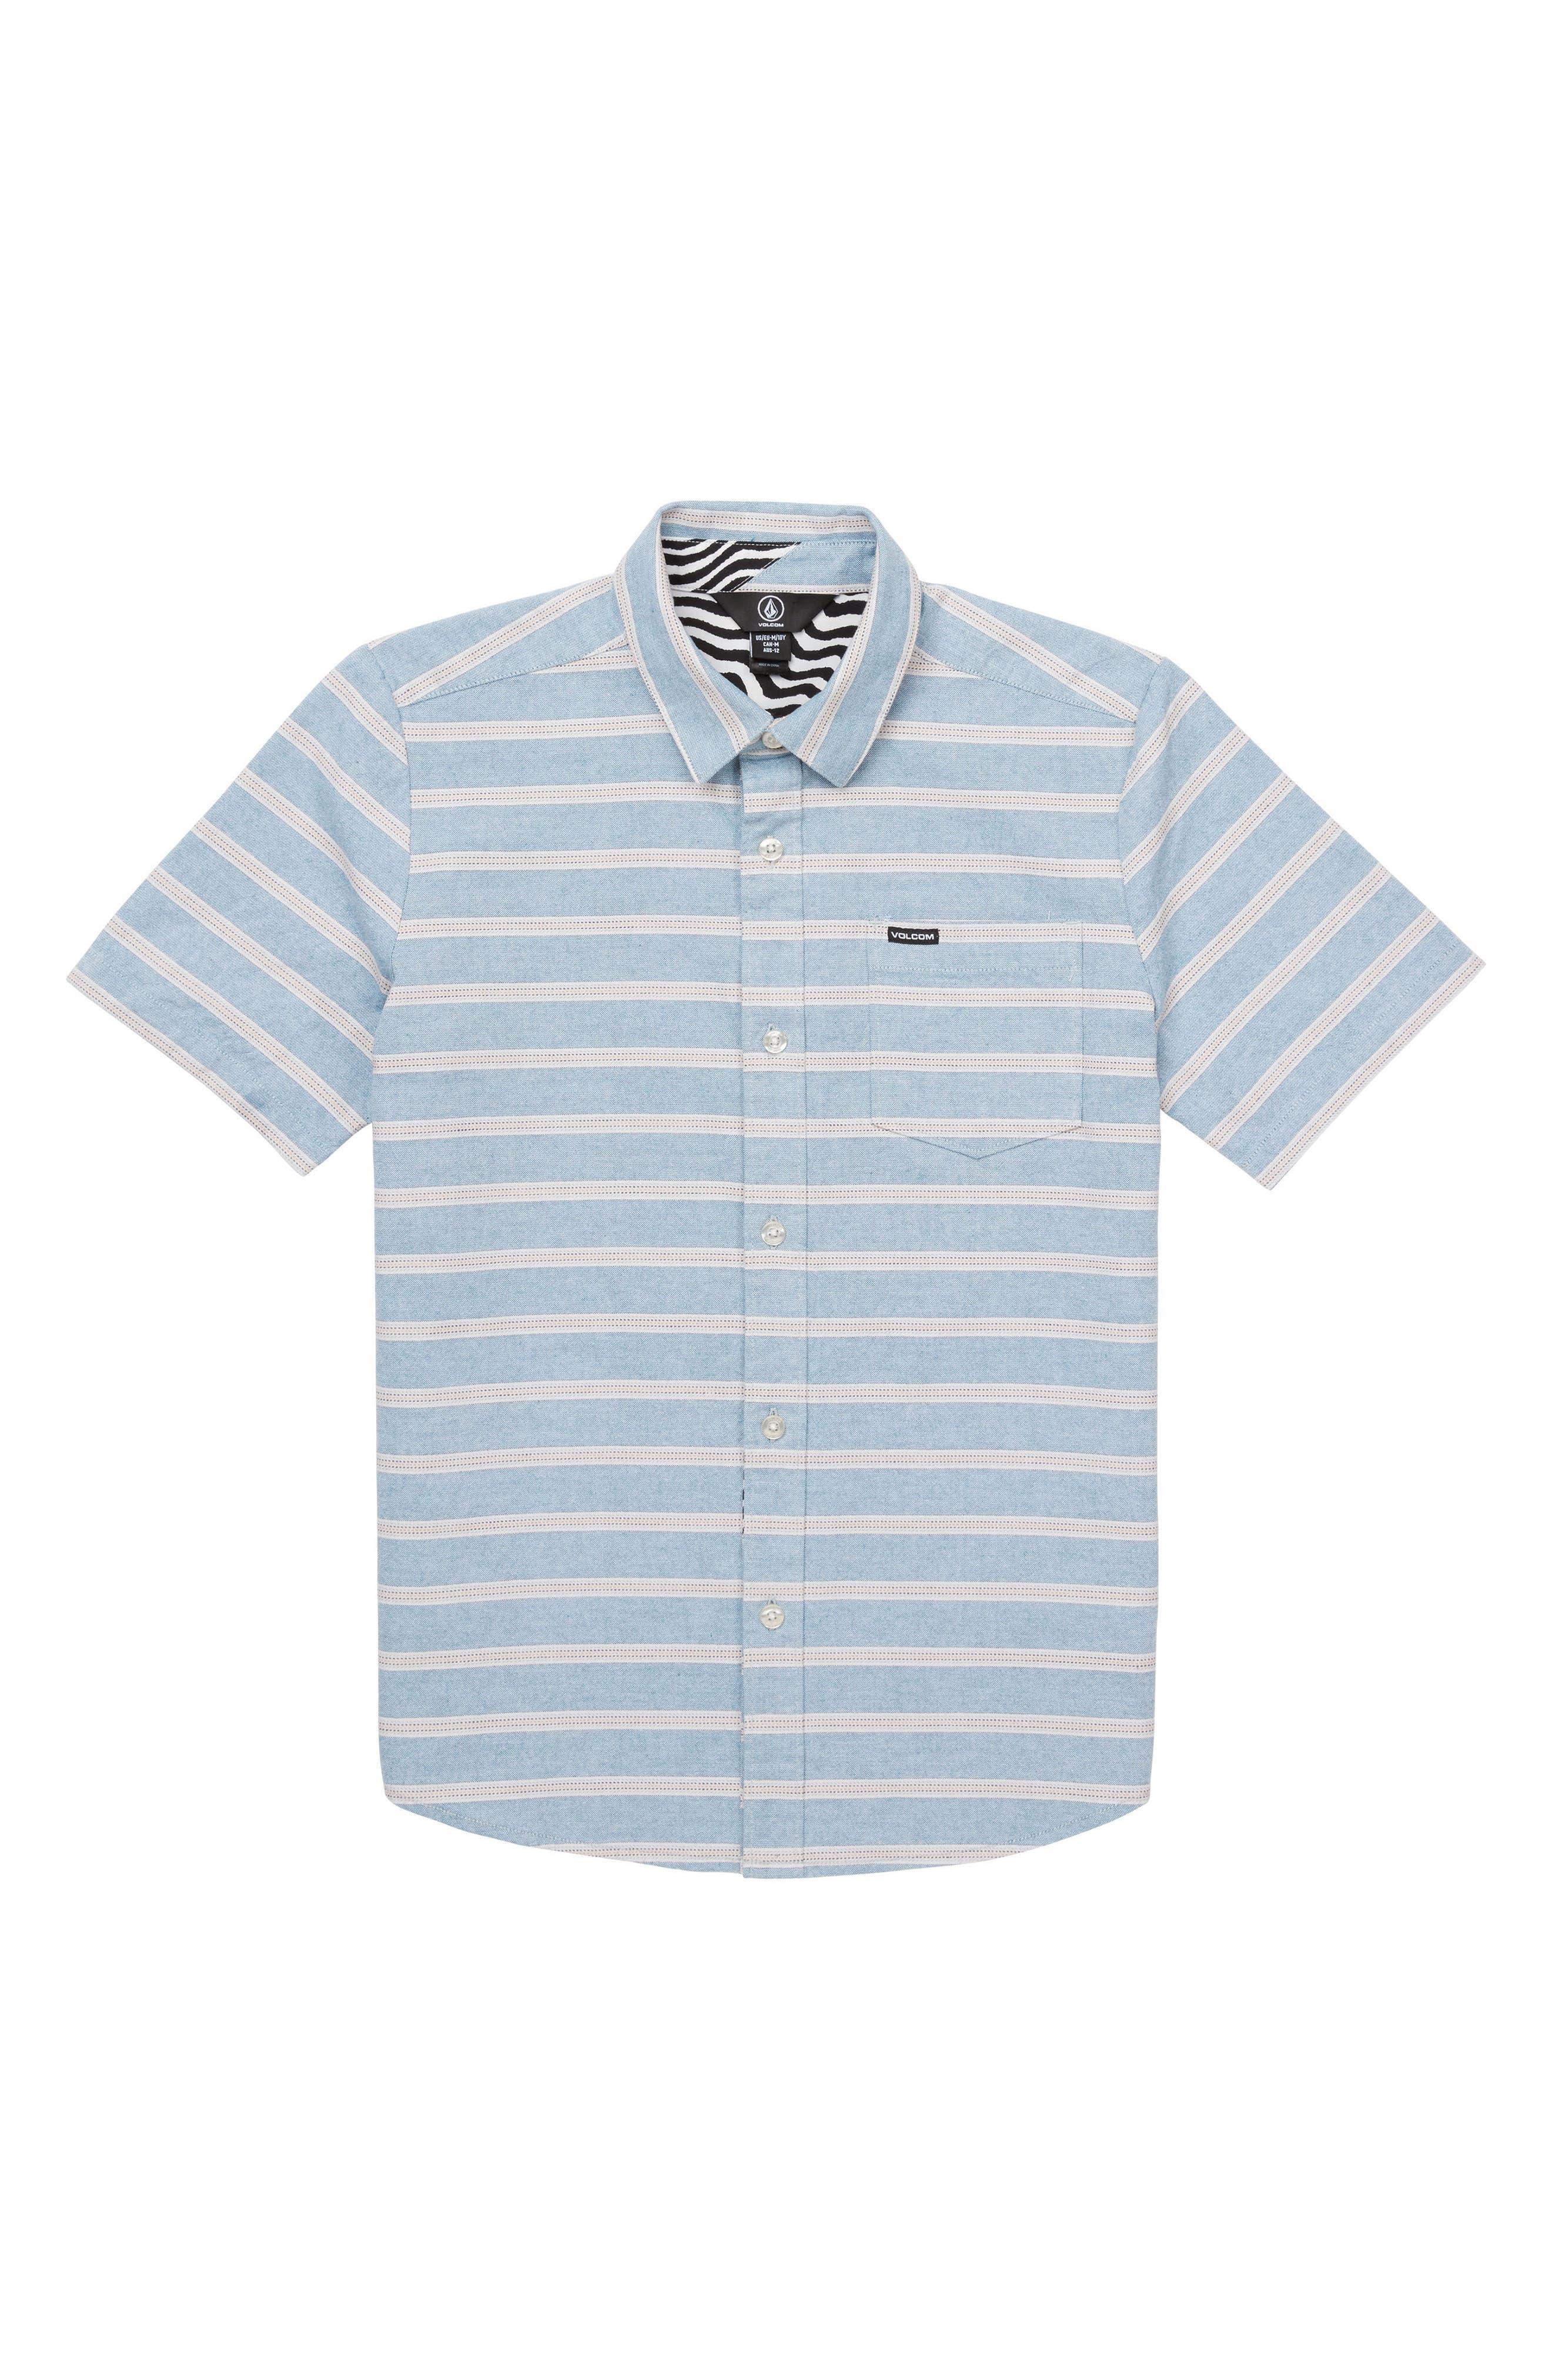 VOLCOM Branson Woven Shirt, Main, color, 439